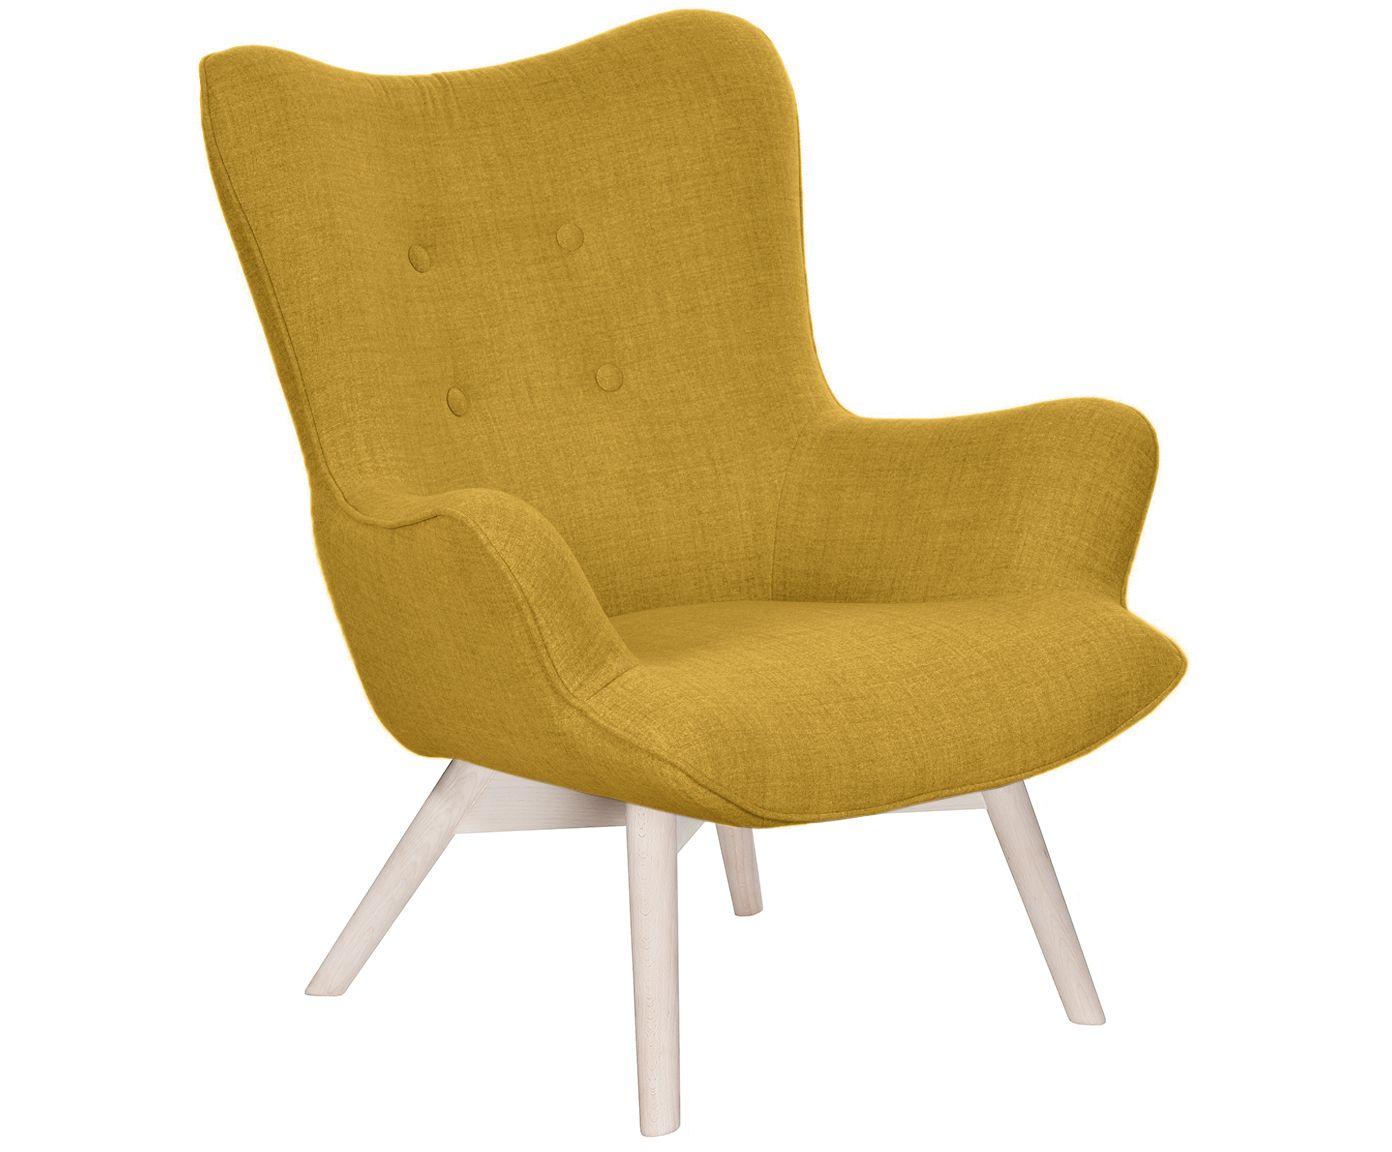 Sessel Gelb   Ohrensessel Gelb Excellent Ohrensessel Ikea Gelb ...